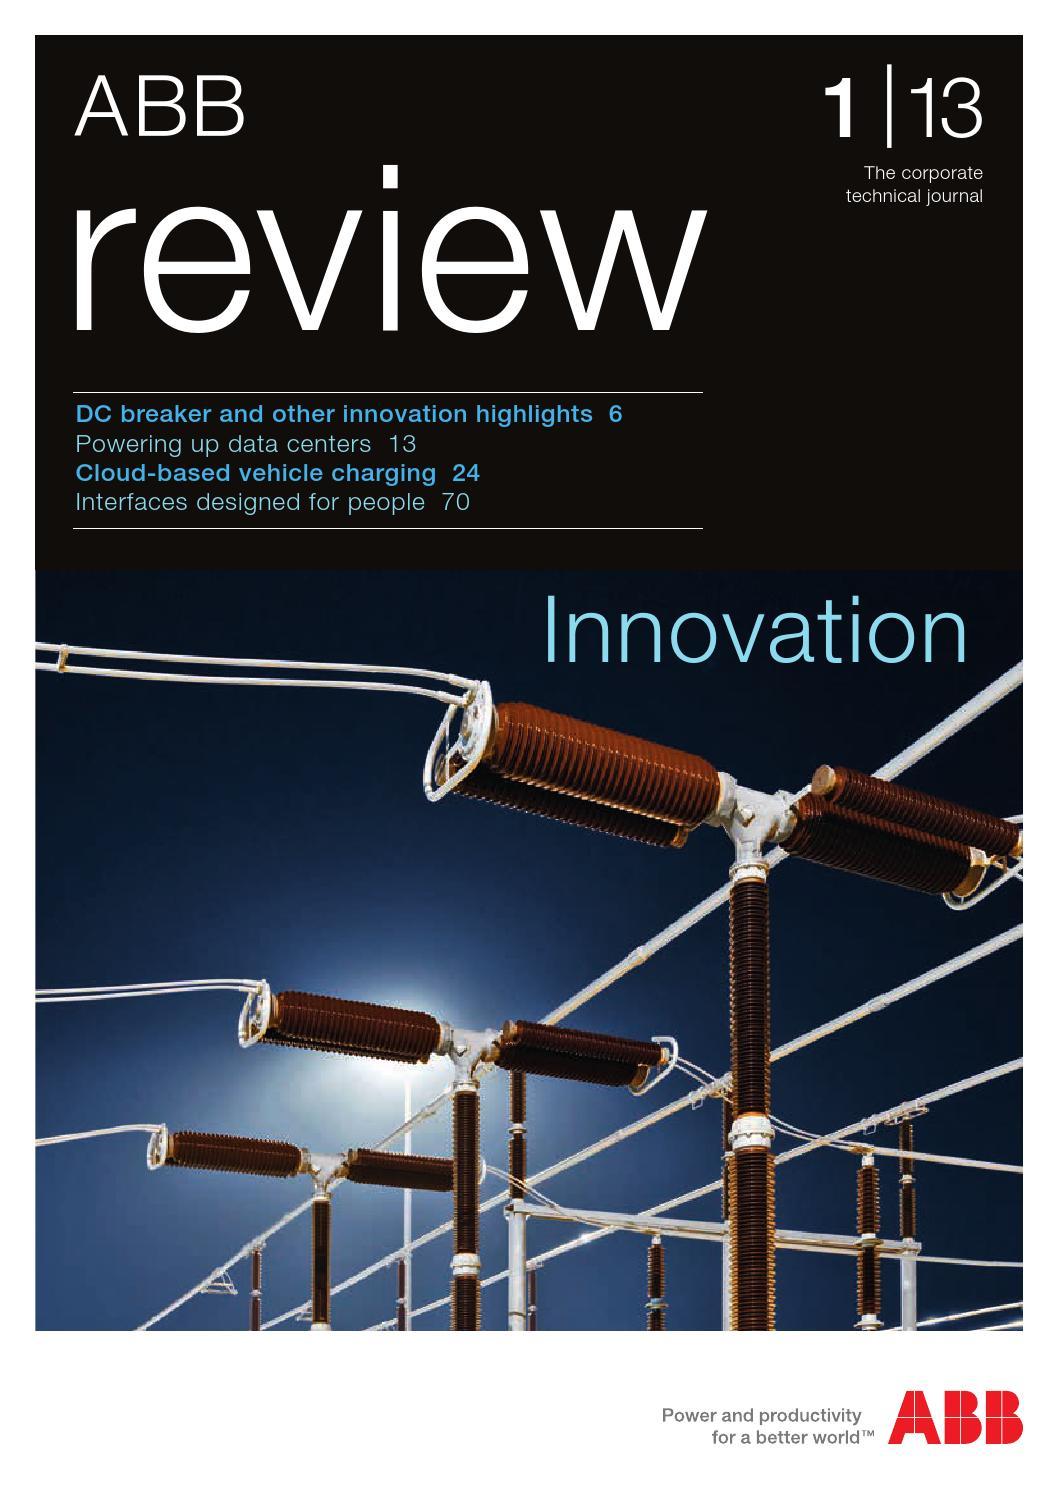 ABB review technical journal - ABB Group